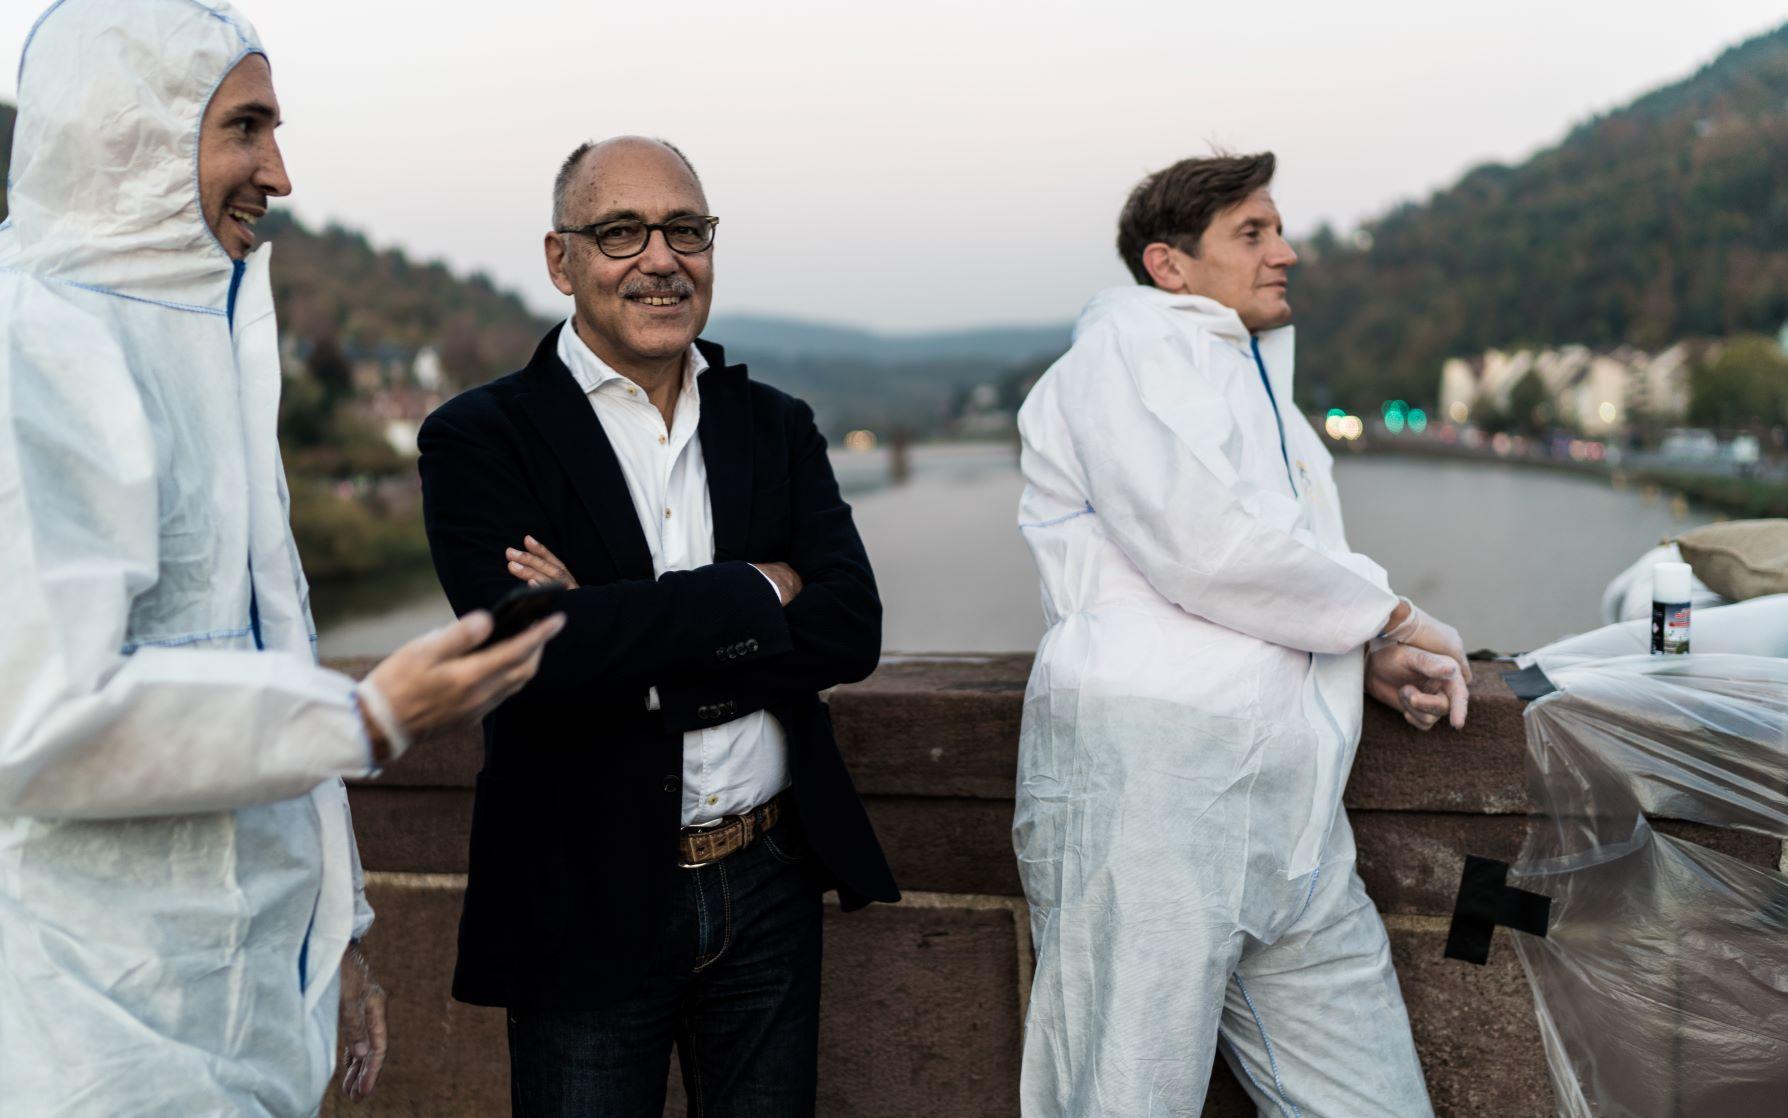 2018-10-SERVANT-LEADERSHIP-Kongress-Fotografie_TINBIRD-FILM-BUREAU-Joana-Kauer-3077.jpg